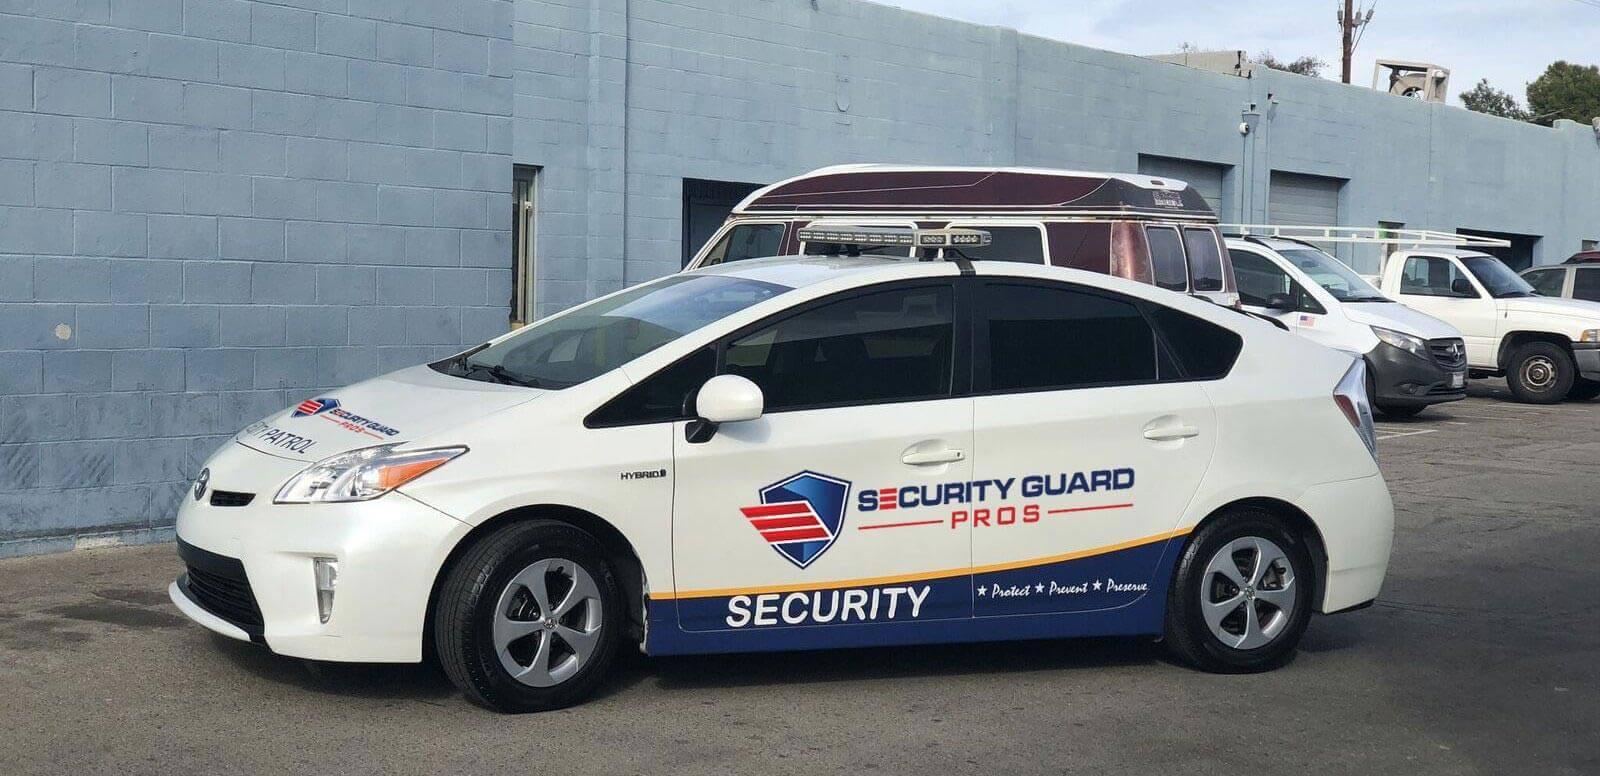 Los Angeles, Orange County Security Guards